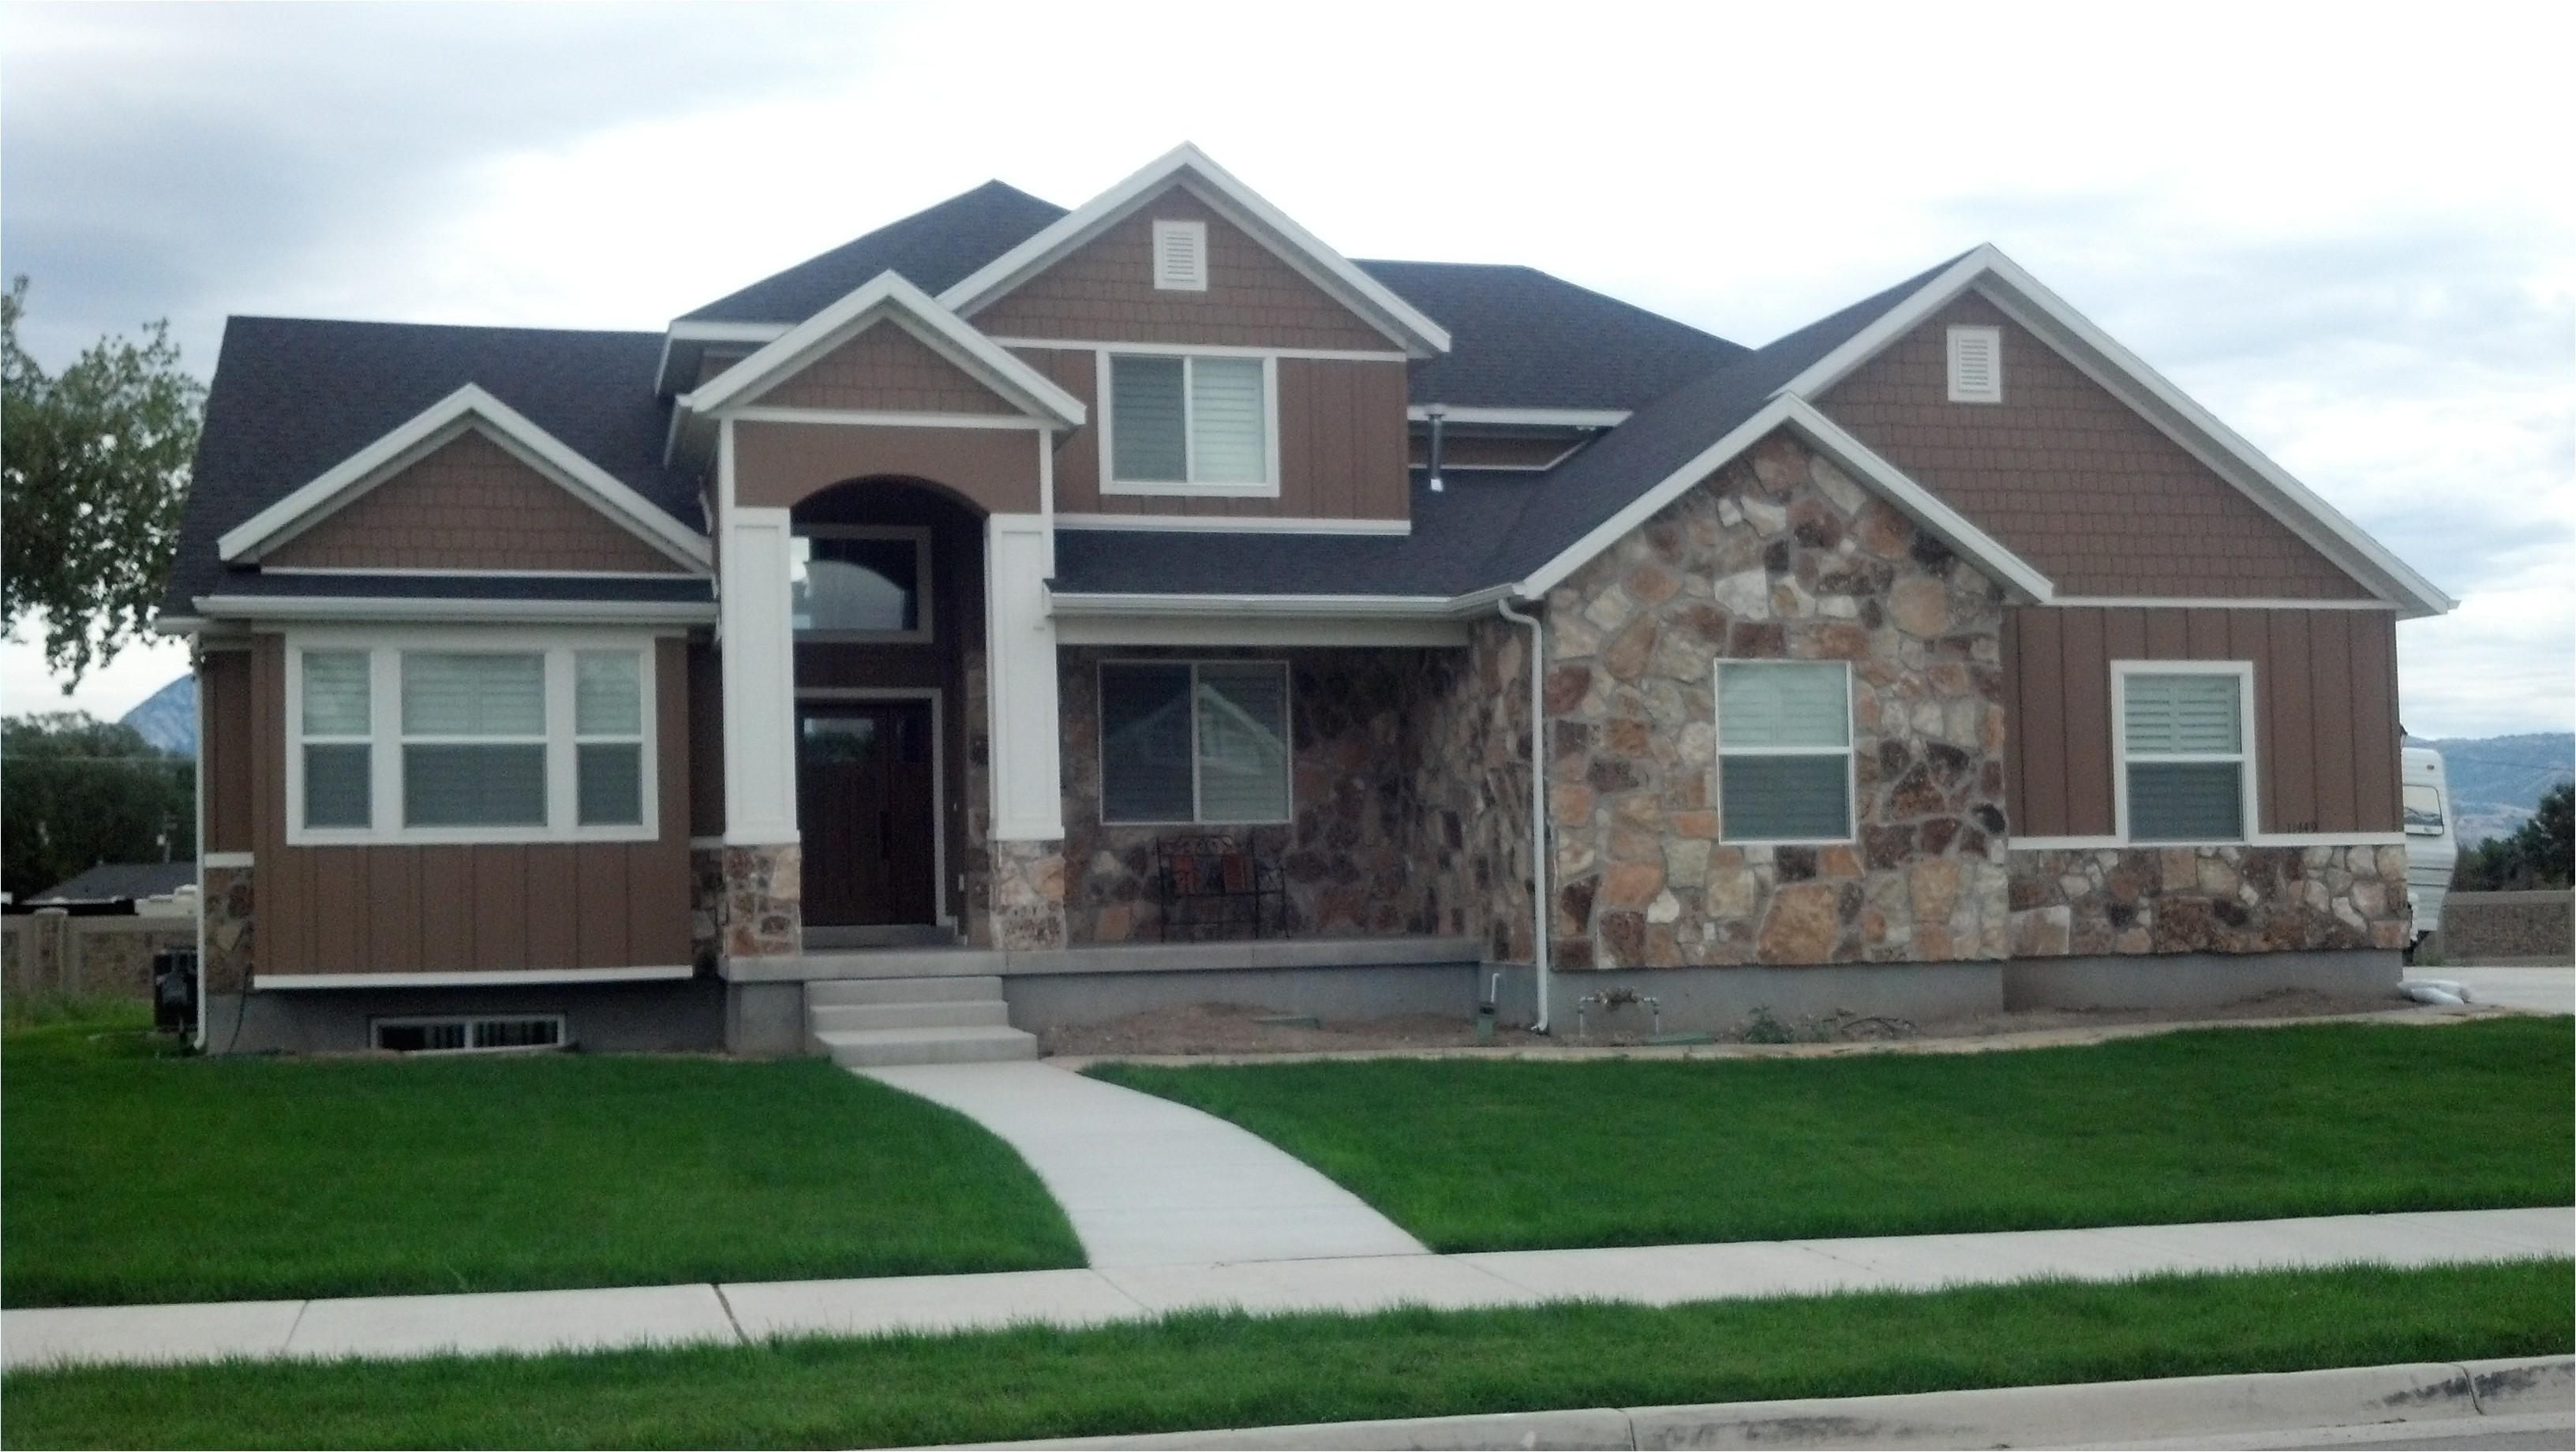 Custom Home Plans for Sale S W Morgan Fine Home Design Communie